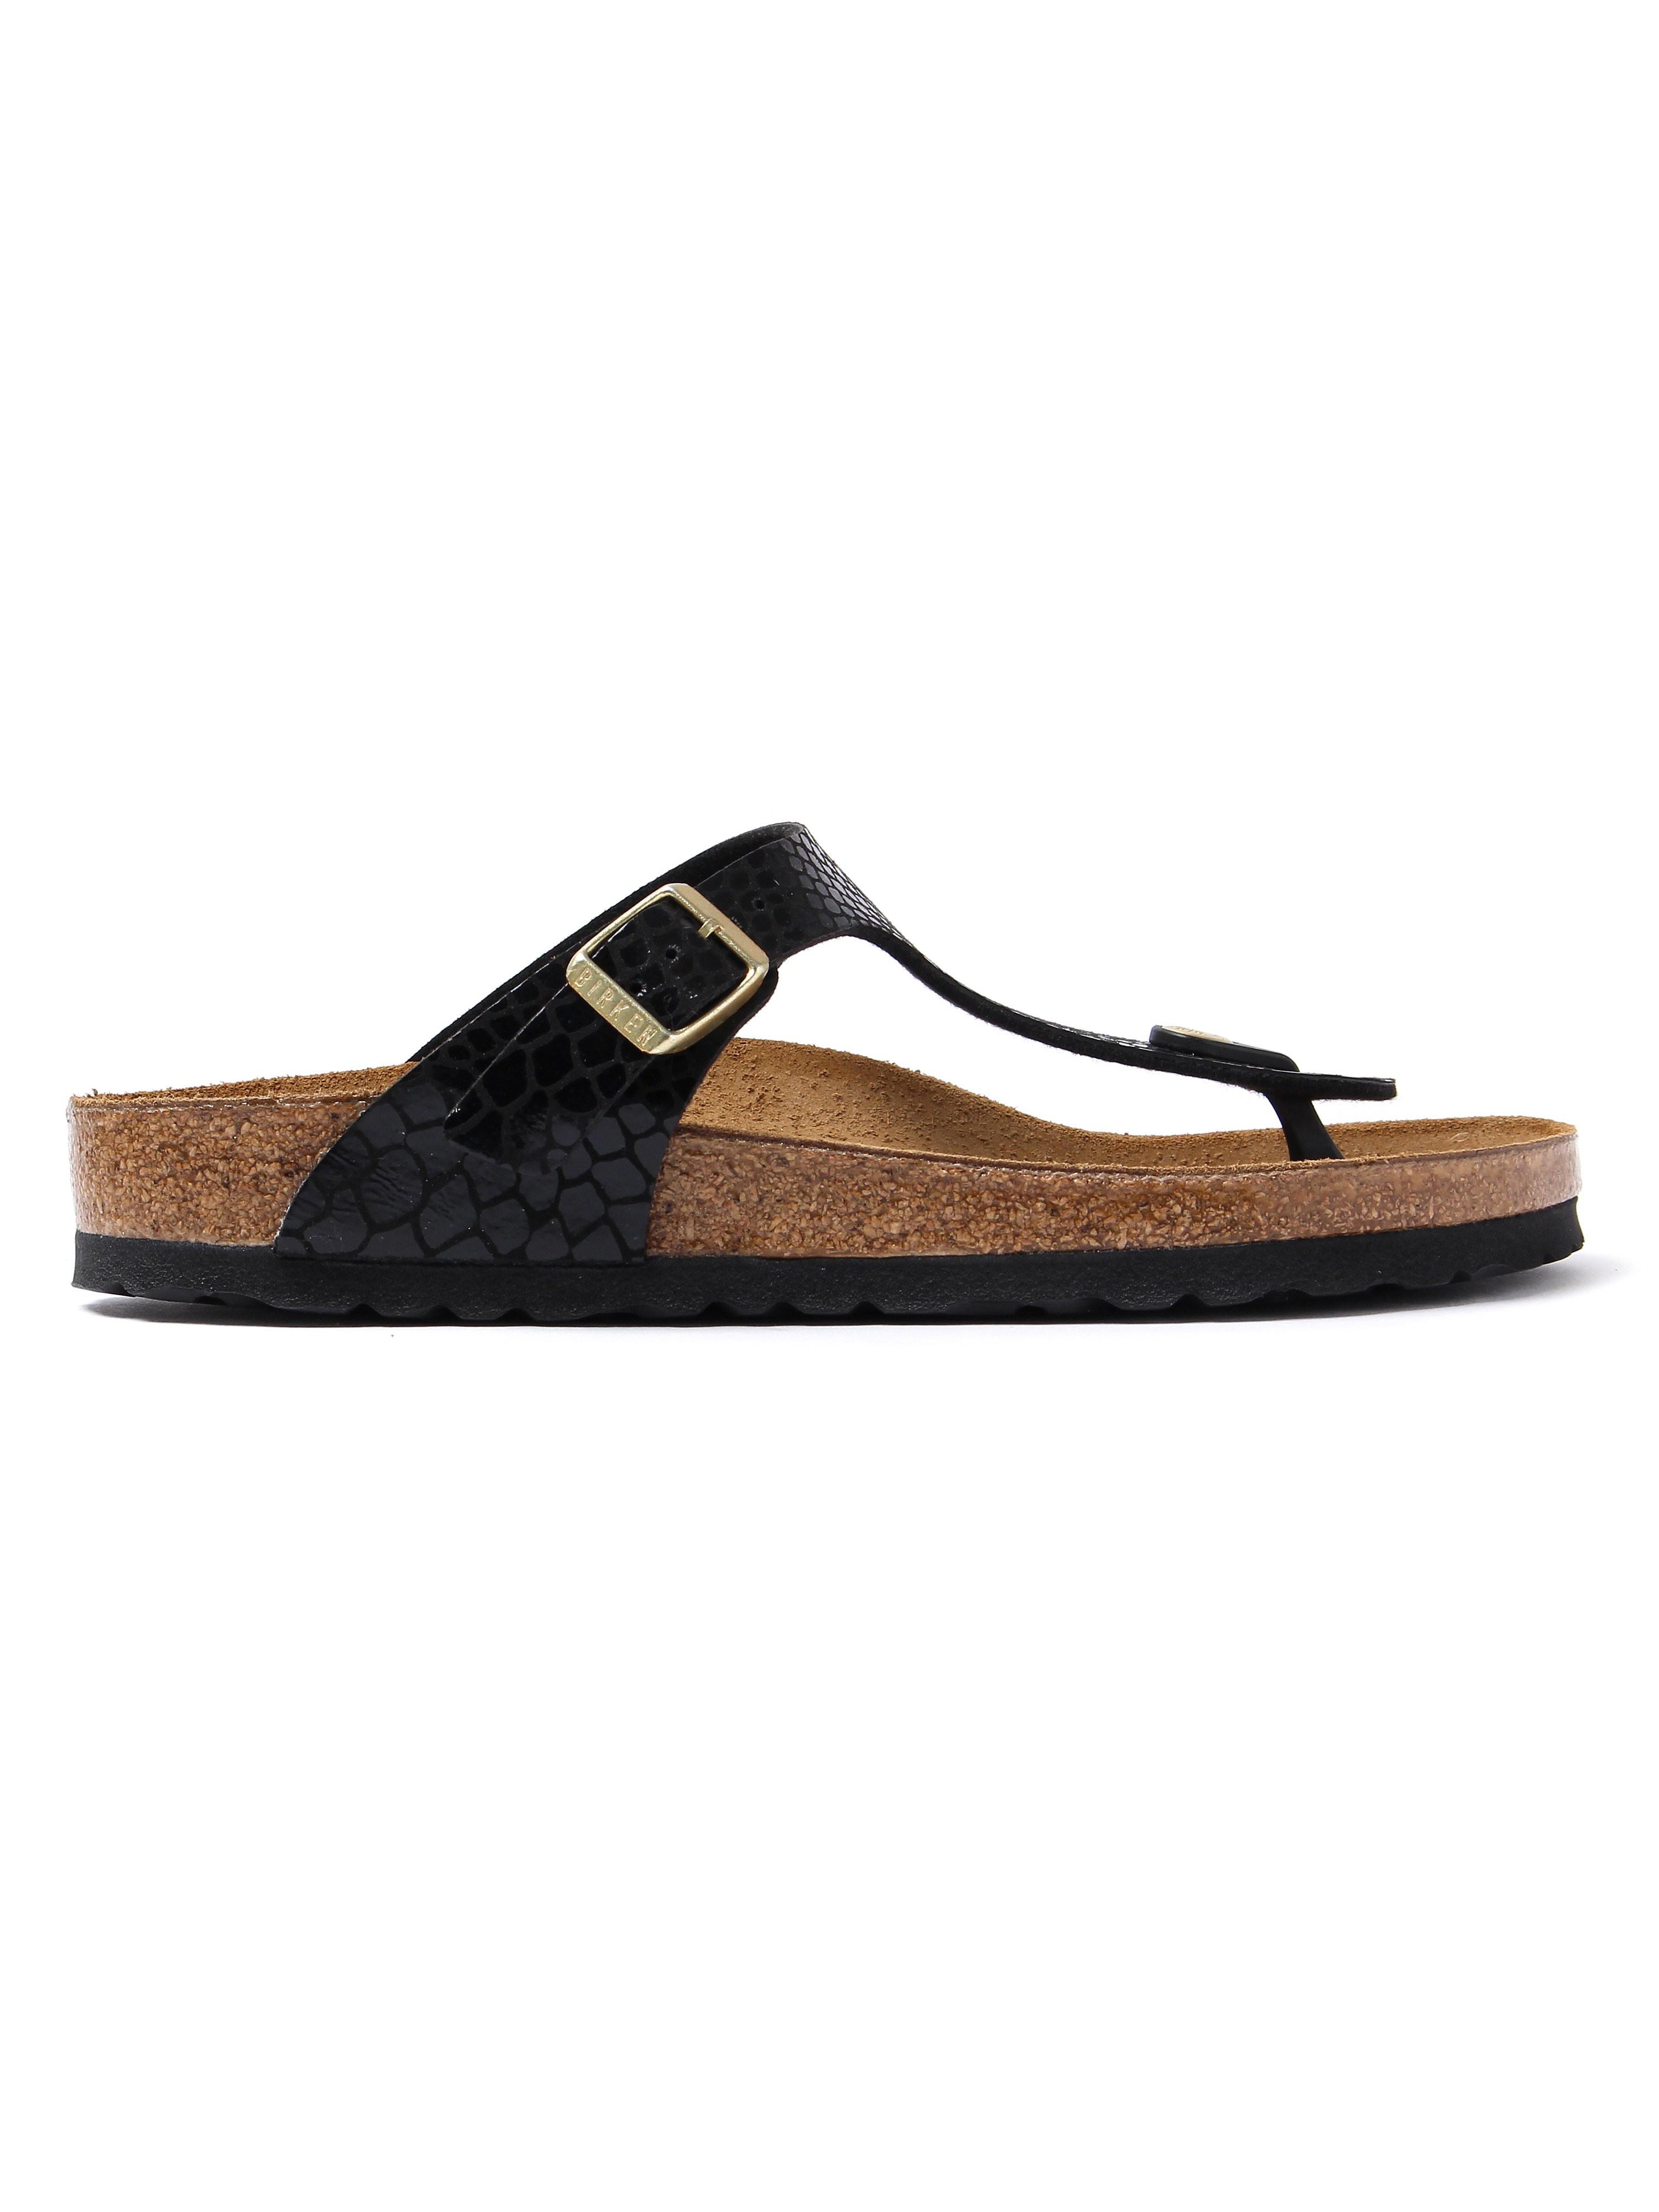 Birkenstock Women's Gizeh Regular Fit Sandals - Black Snakeskin